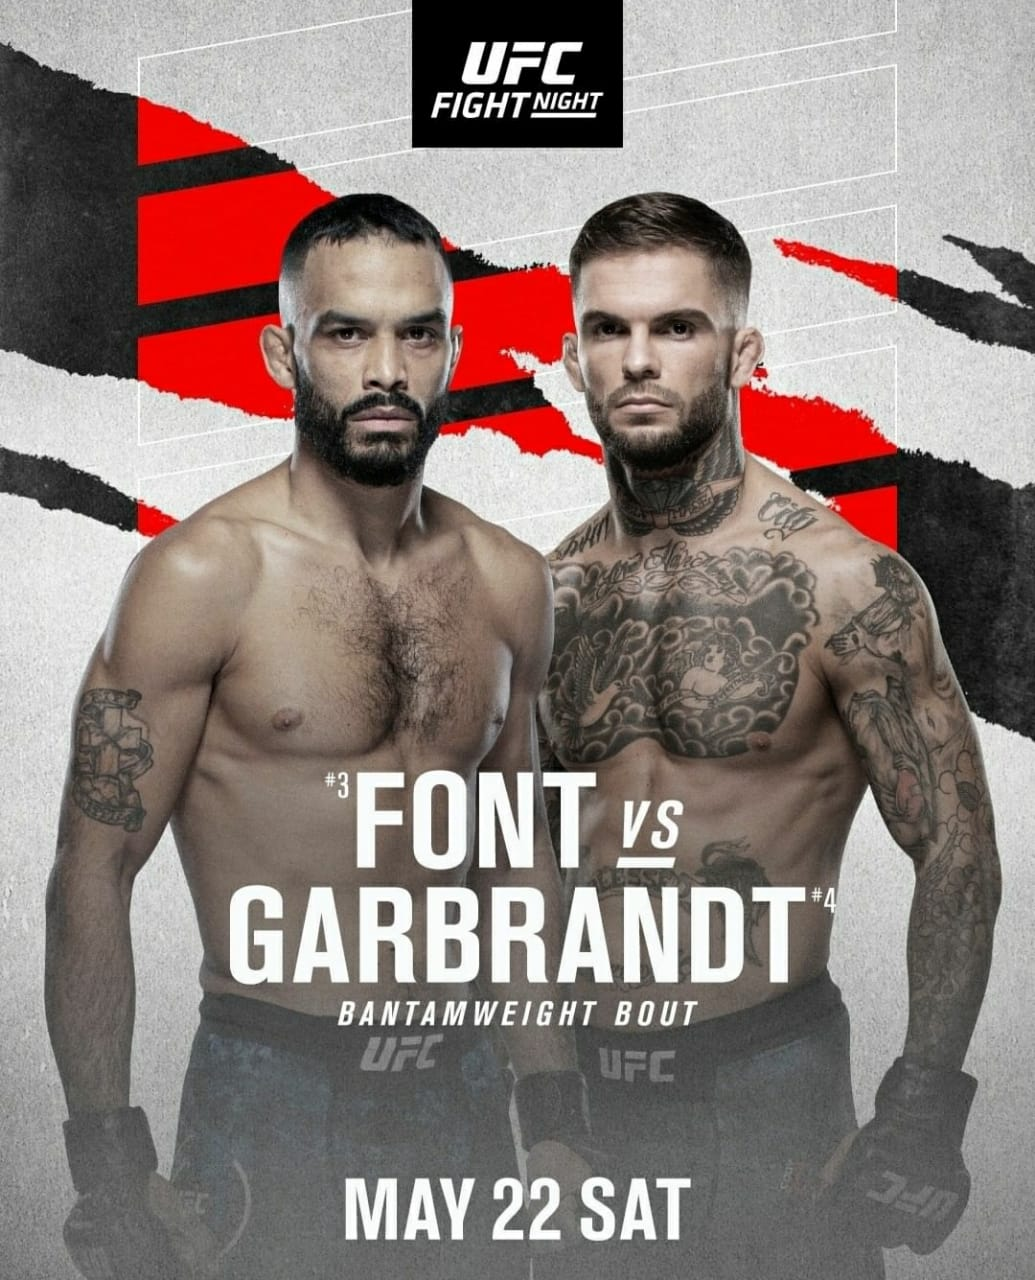 2021 UFC Fight Night | Ultimate Fighting Championship Font vs Garbrandt